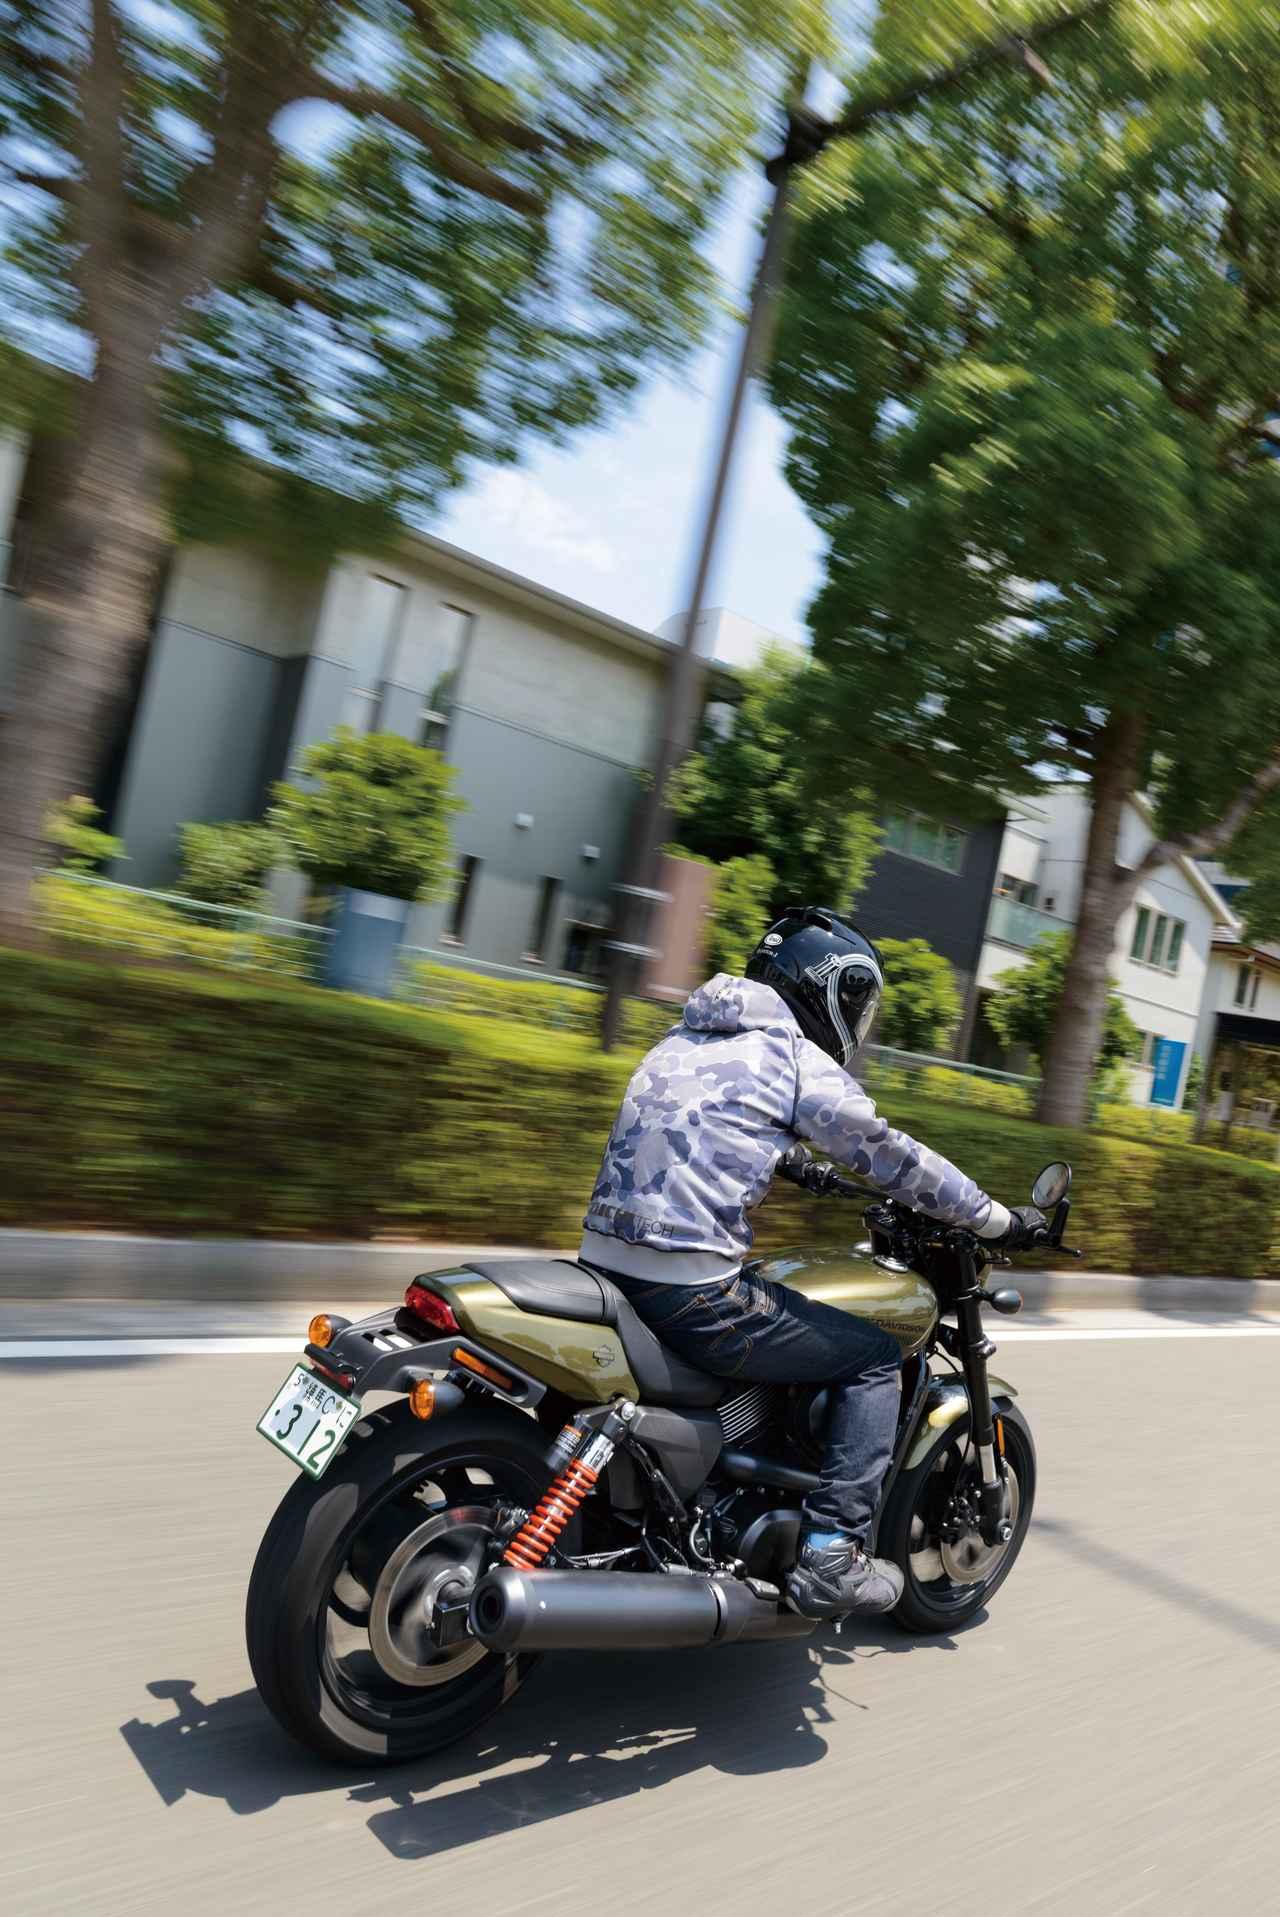 Images : 3番目の画像 - HARLEY-DAVIDSON STREET ROD[XG750A] - webオートバイ